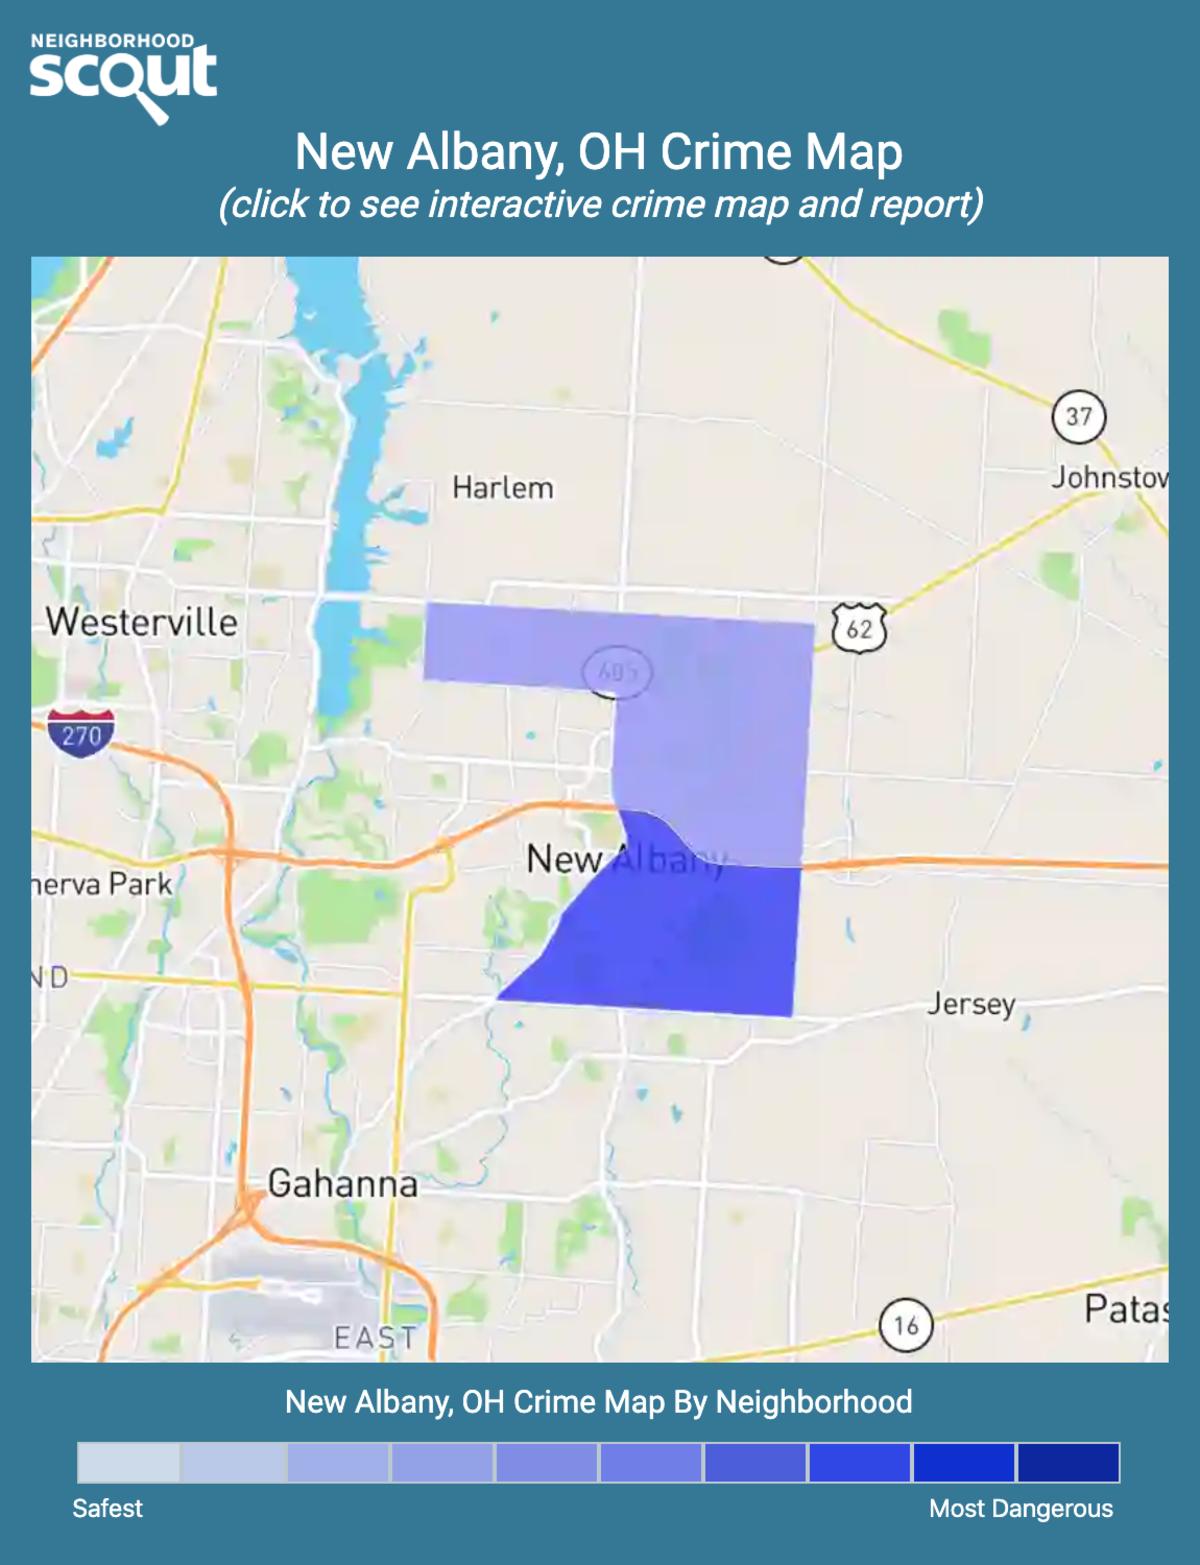 New Albany, Ohio crime map